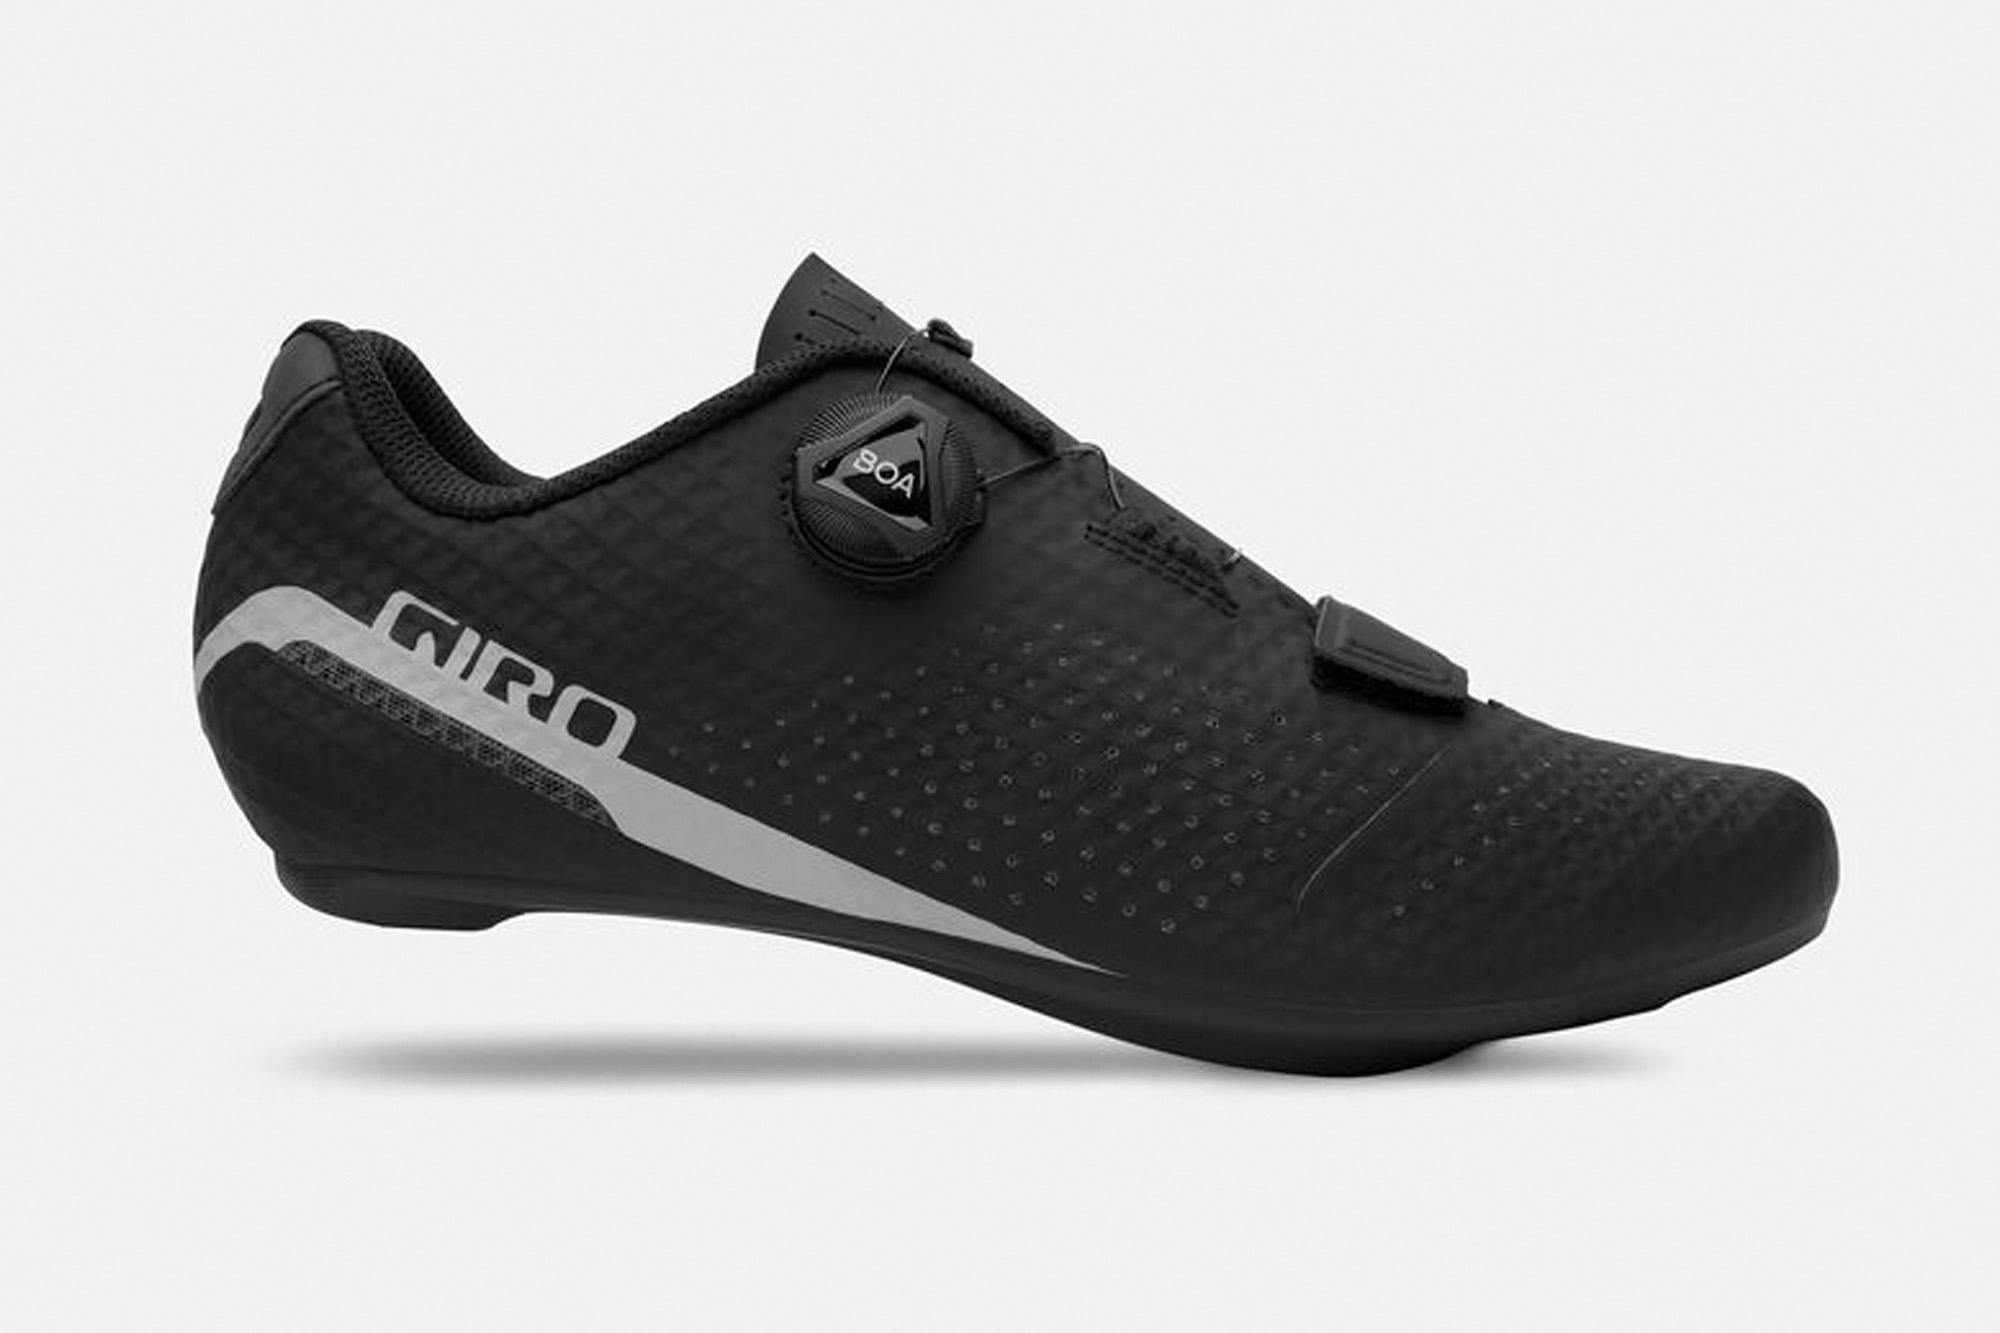 Giro cykelsko: Cadet